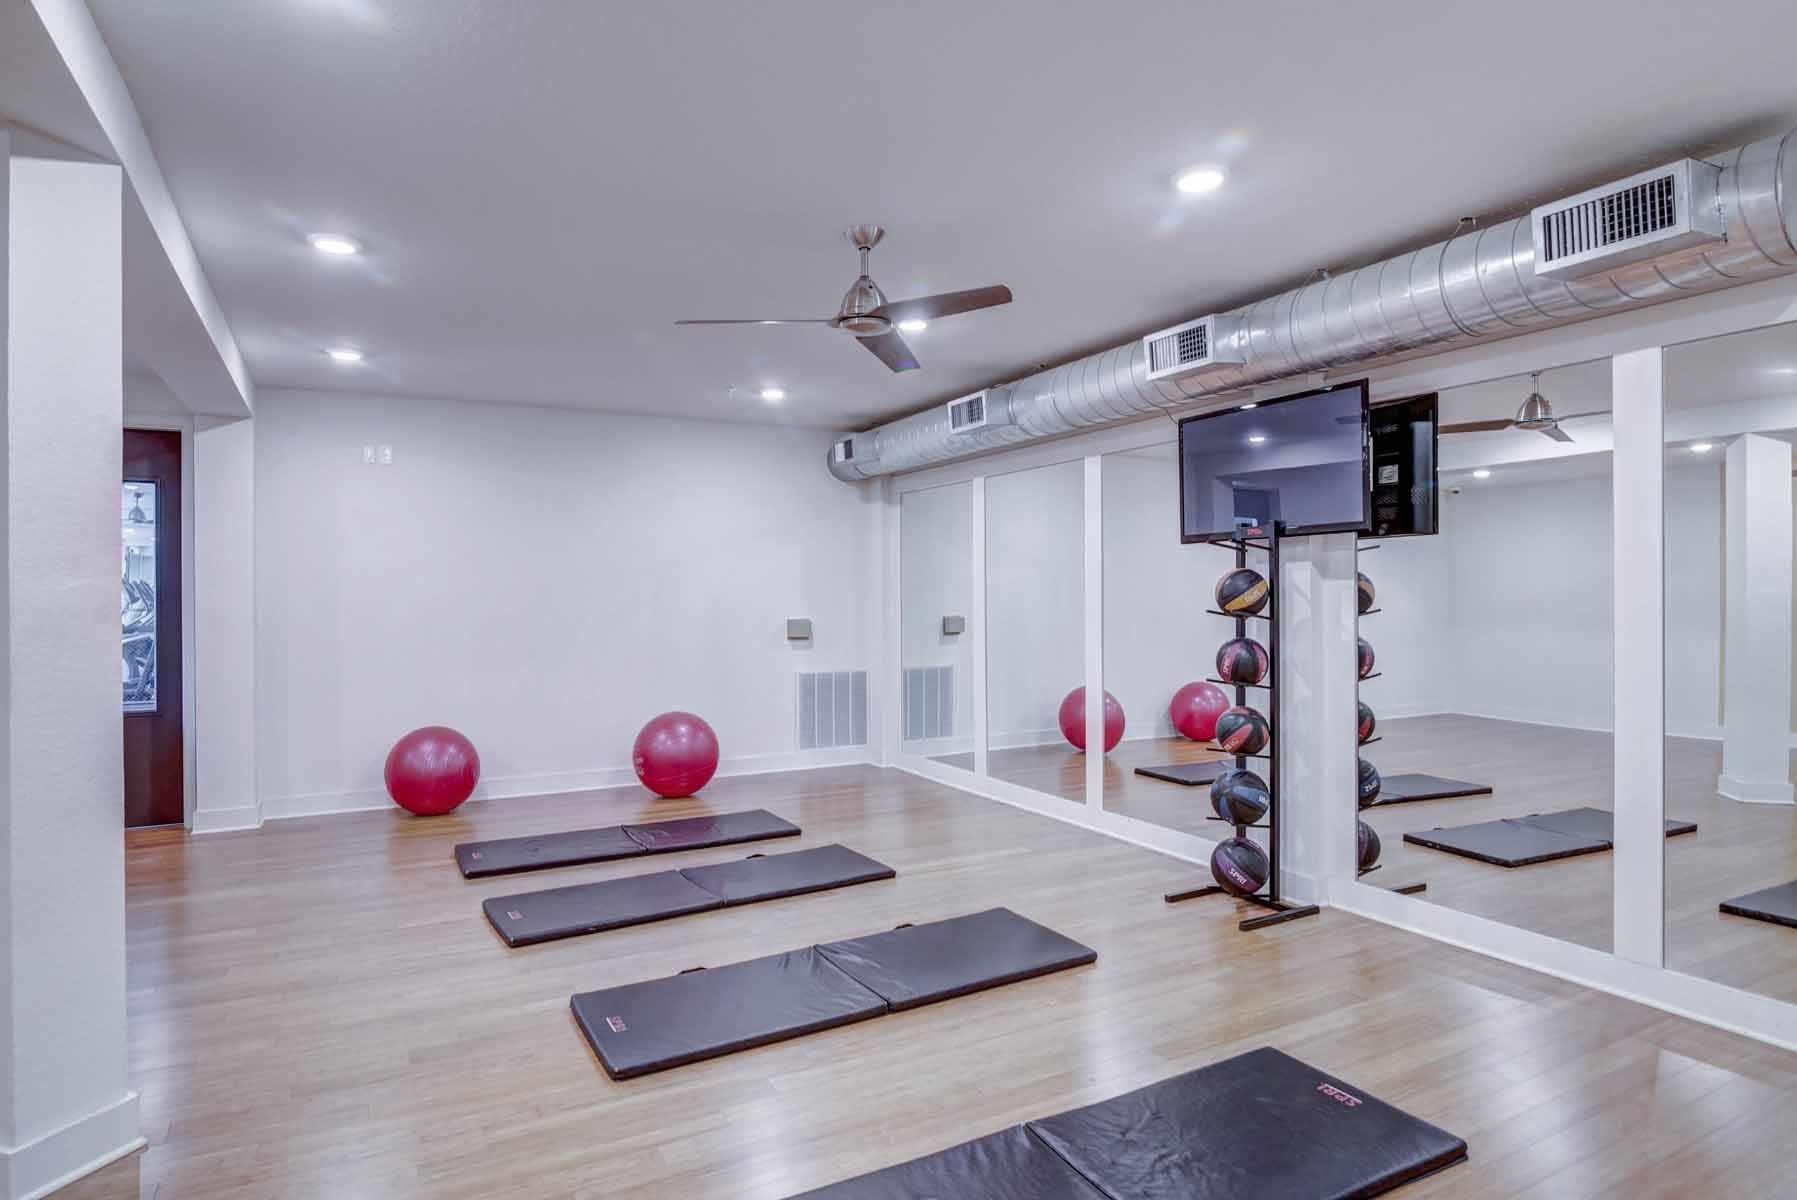 Catalyst-Tallahassee-Yoga-Room-Unilodgers